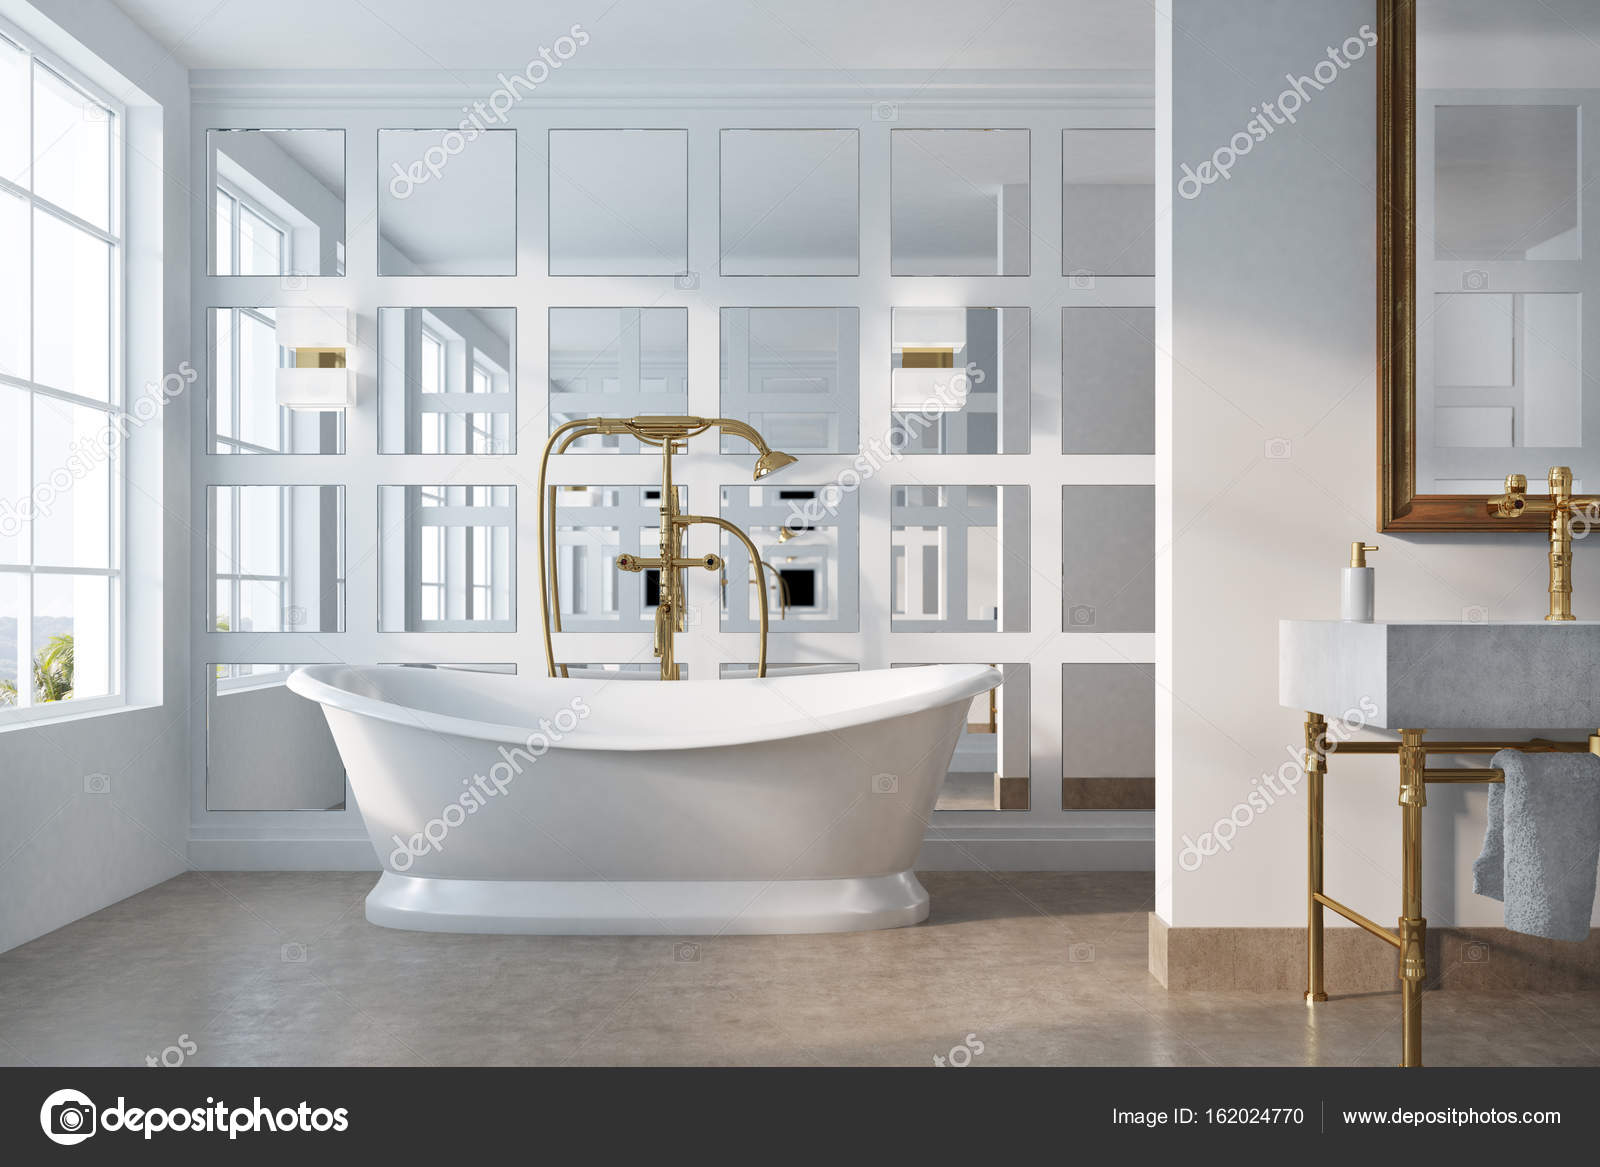 Bagno vintage vasca bianca specchio foto stock denisismagilov 162024770 - Vasca da bagno retro ...